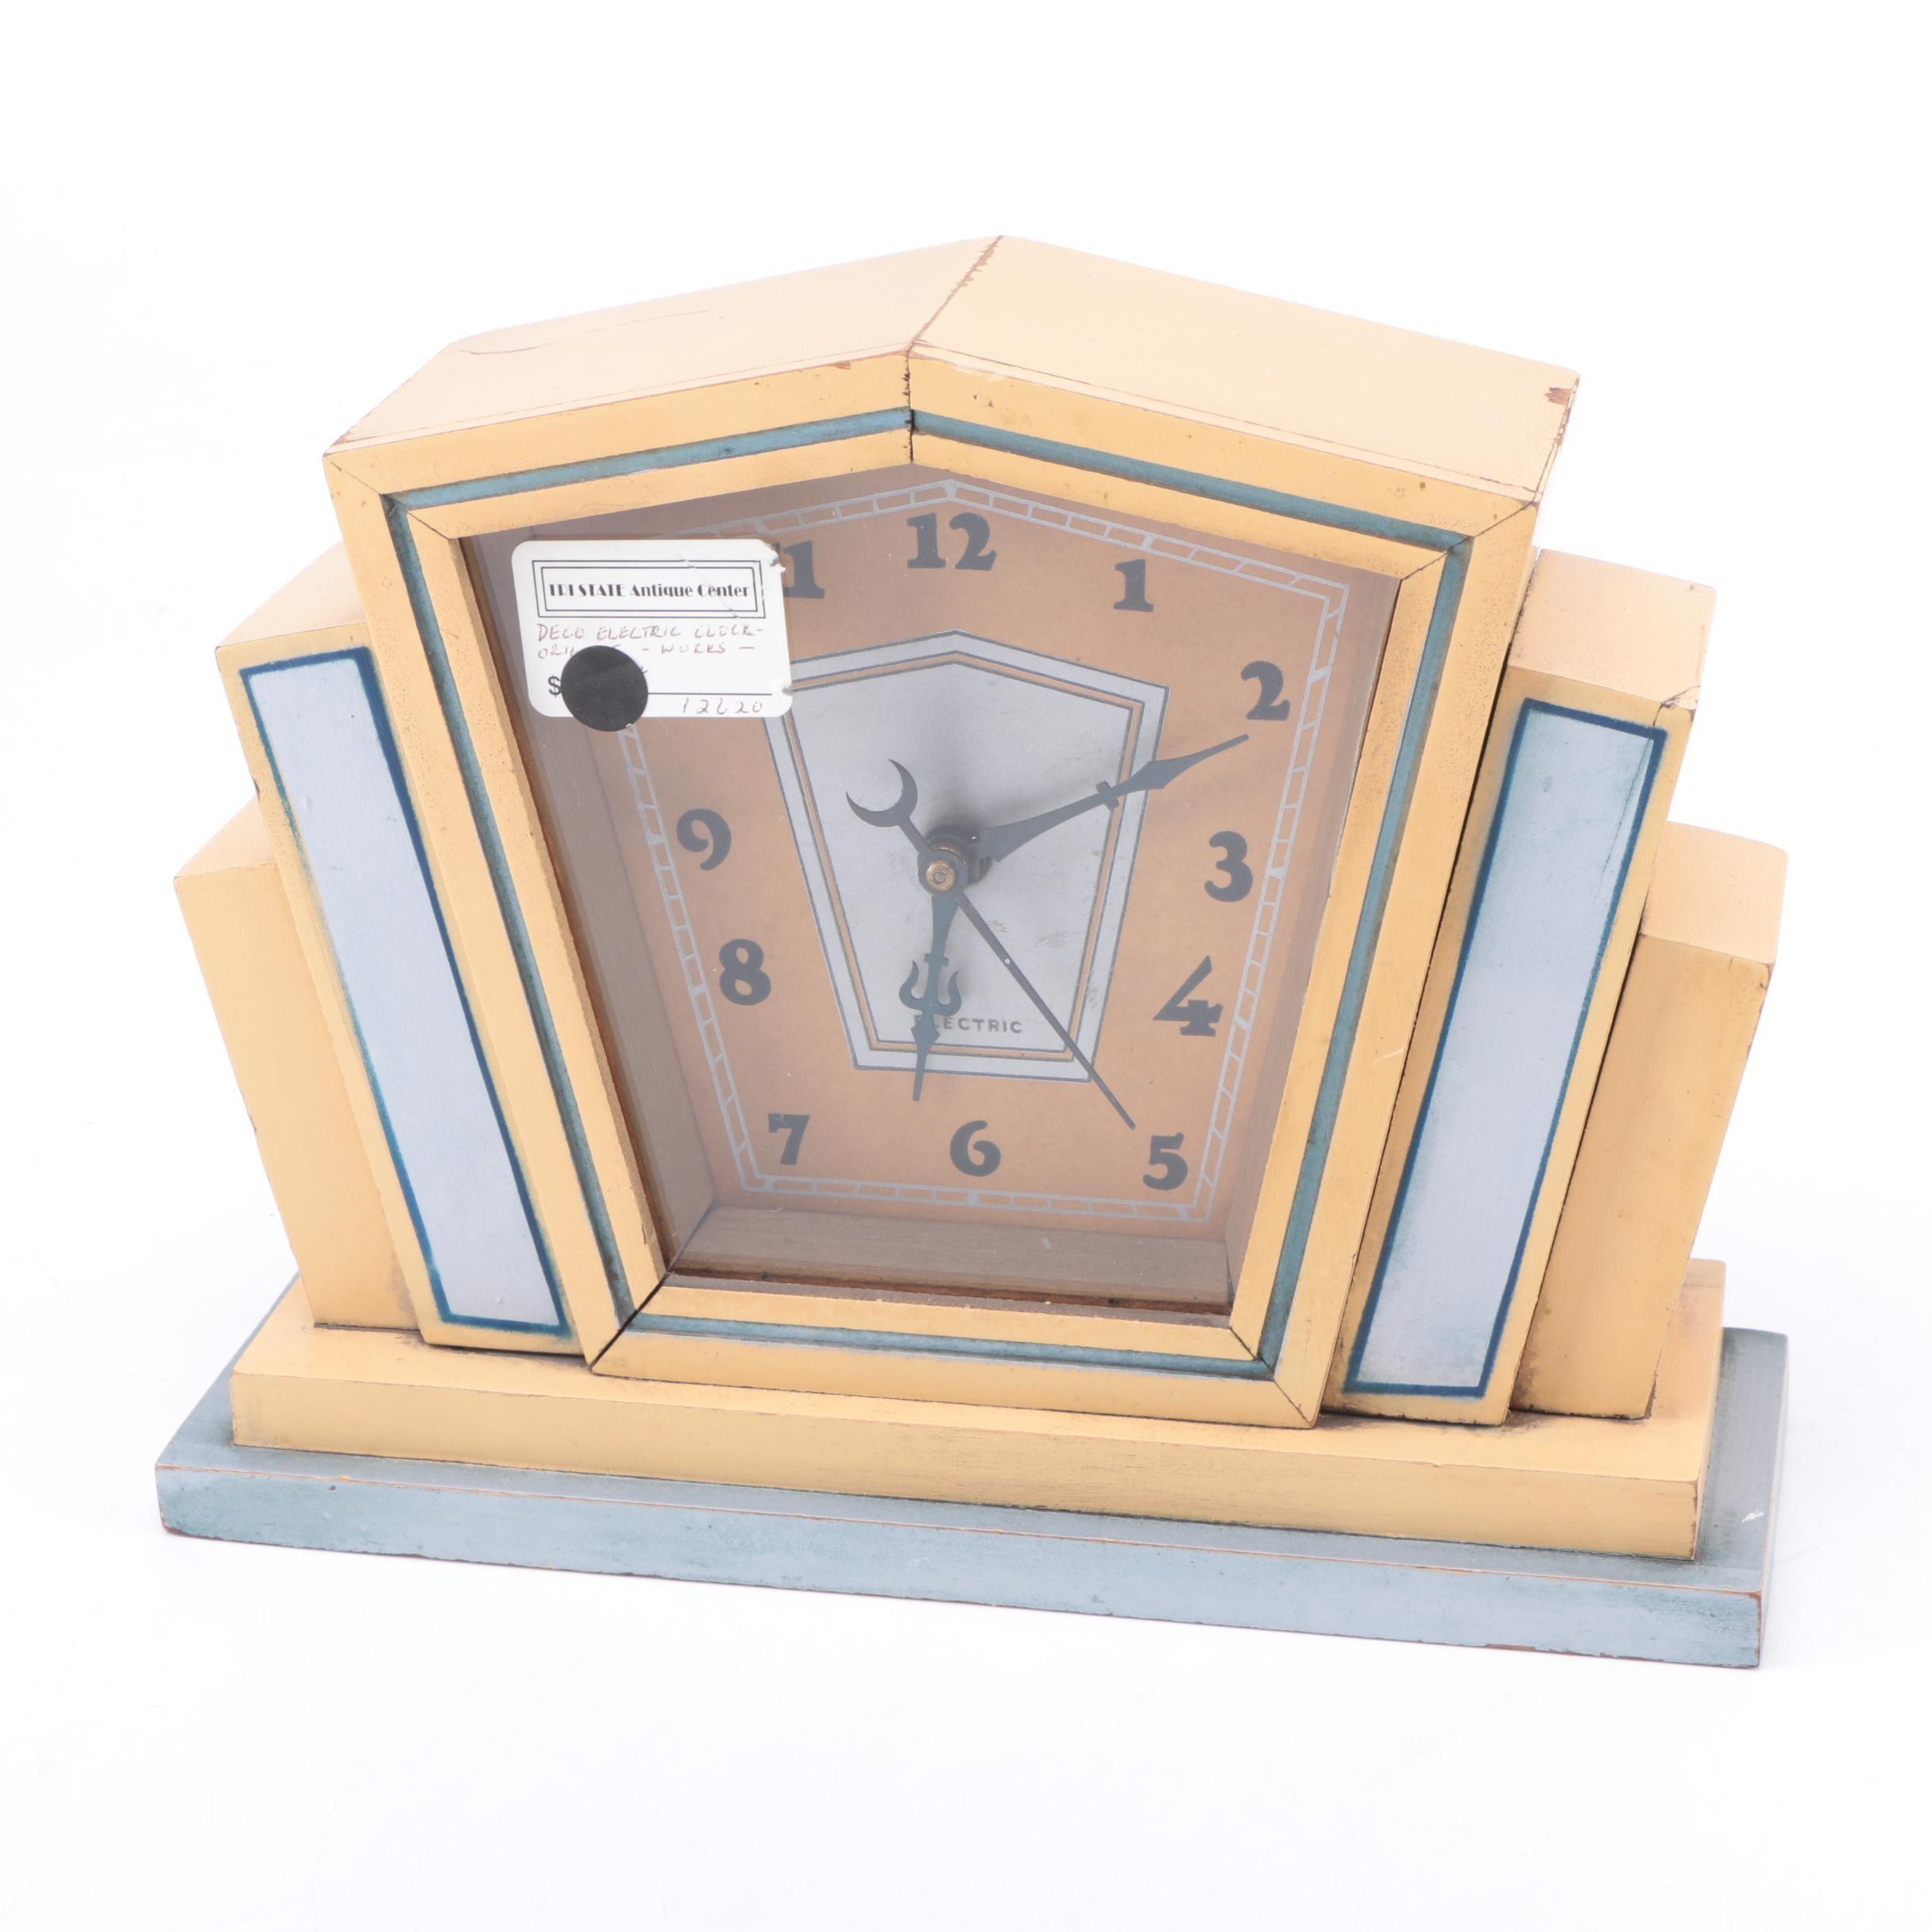 Vintage Art Deco Electric Mantel Clock